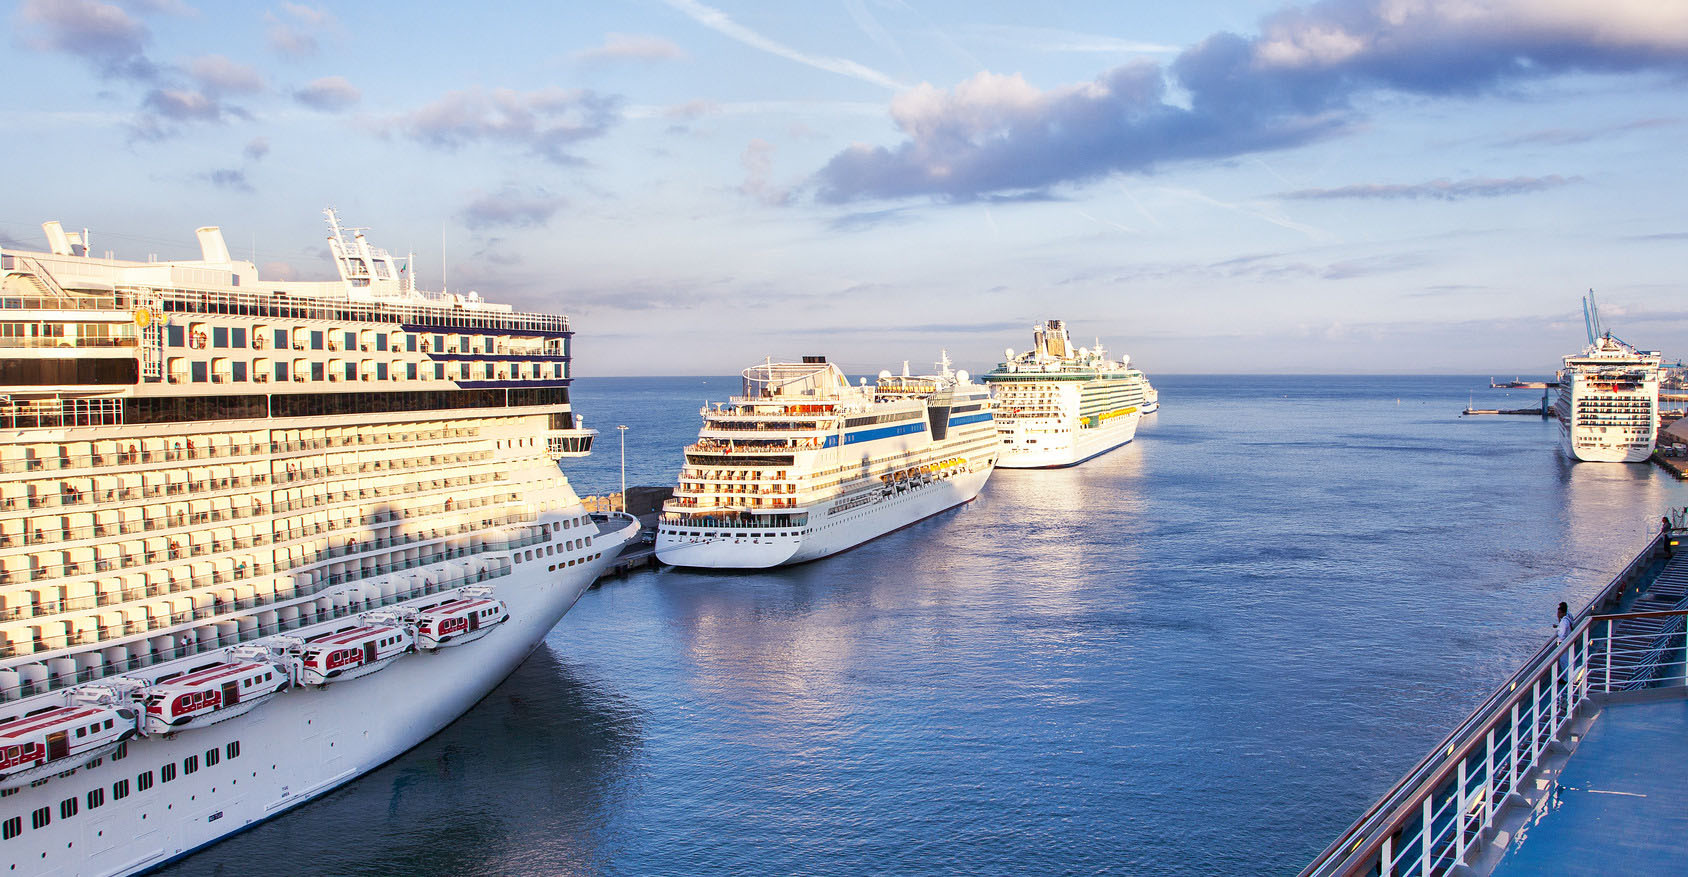 Rome to cruise ship terminal - Port of civitavecchia cruise terminal ...